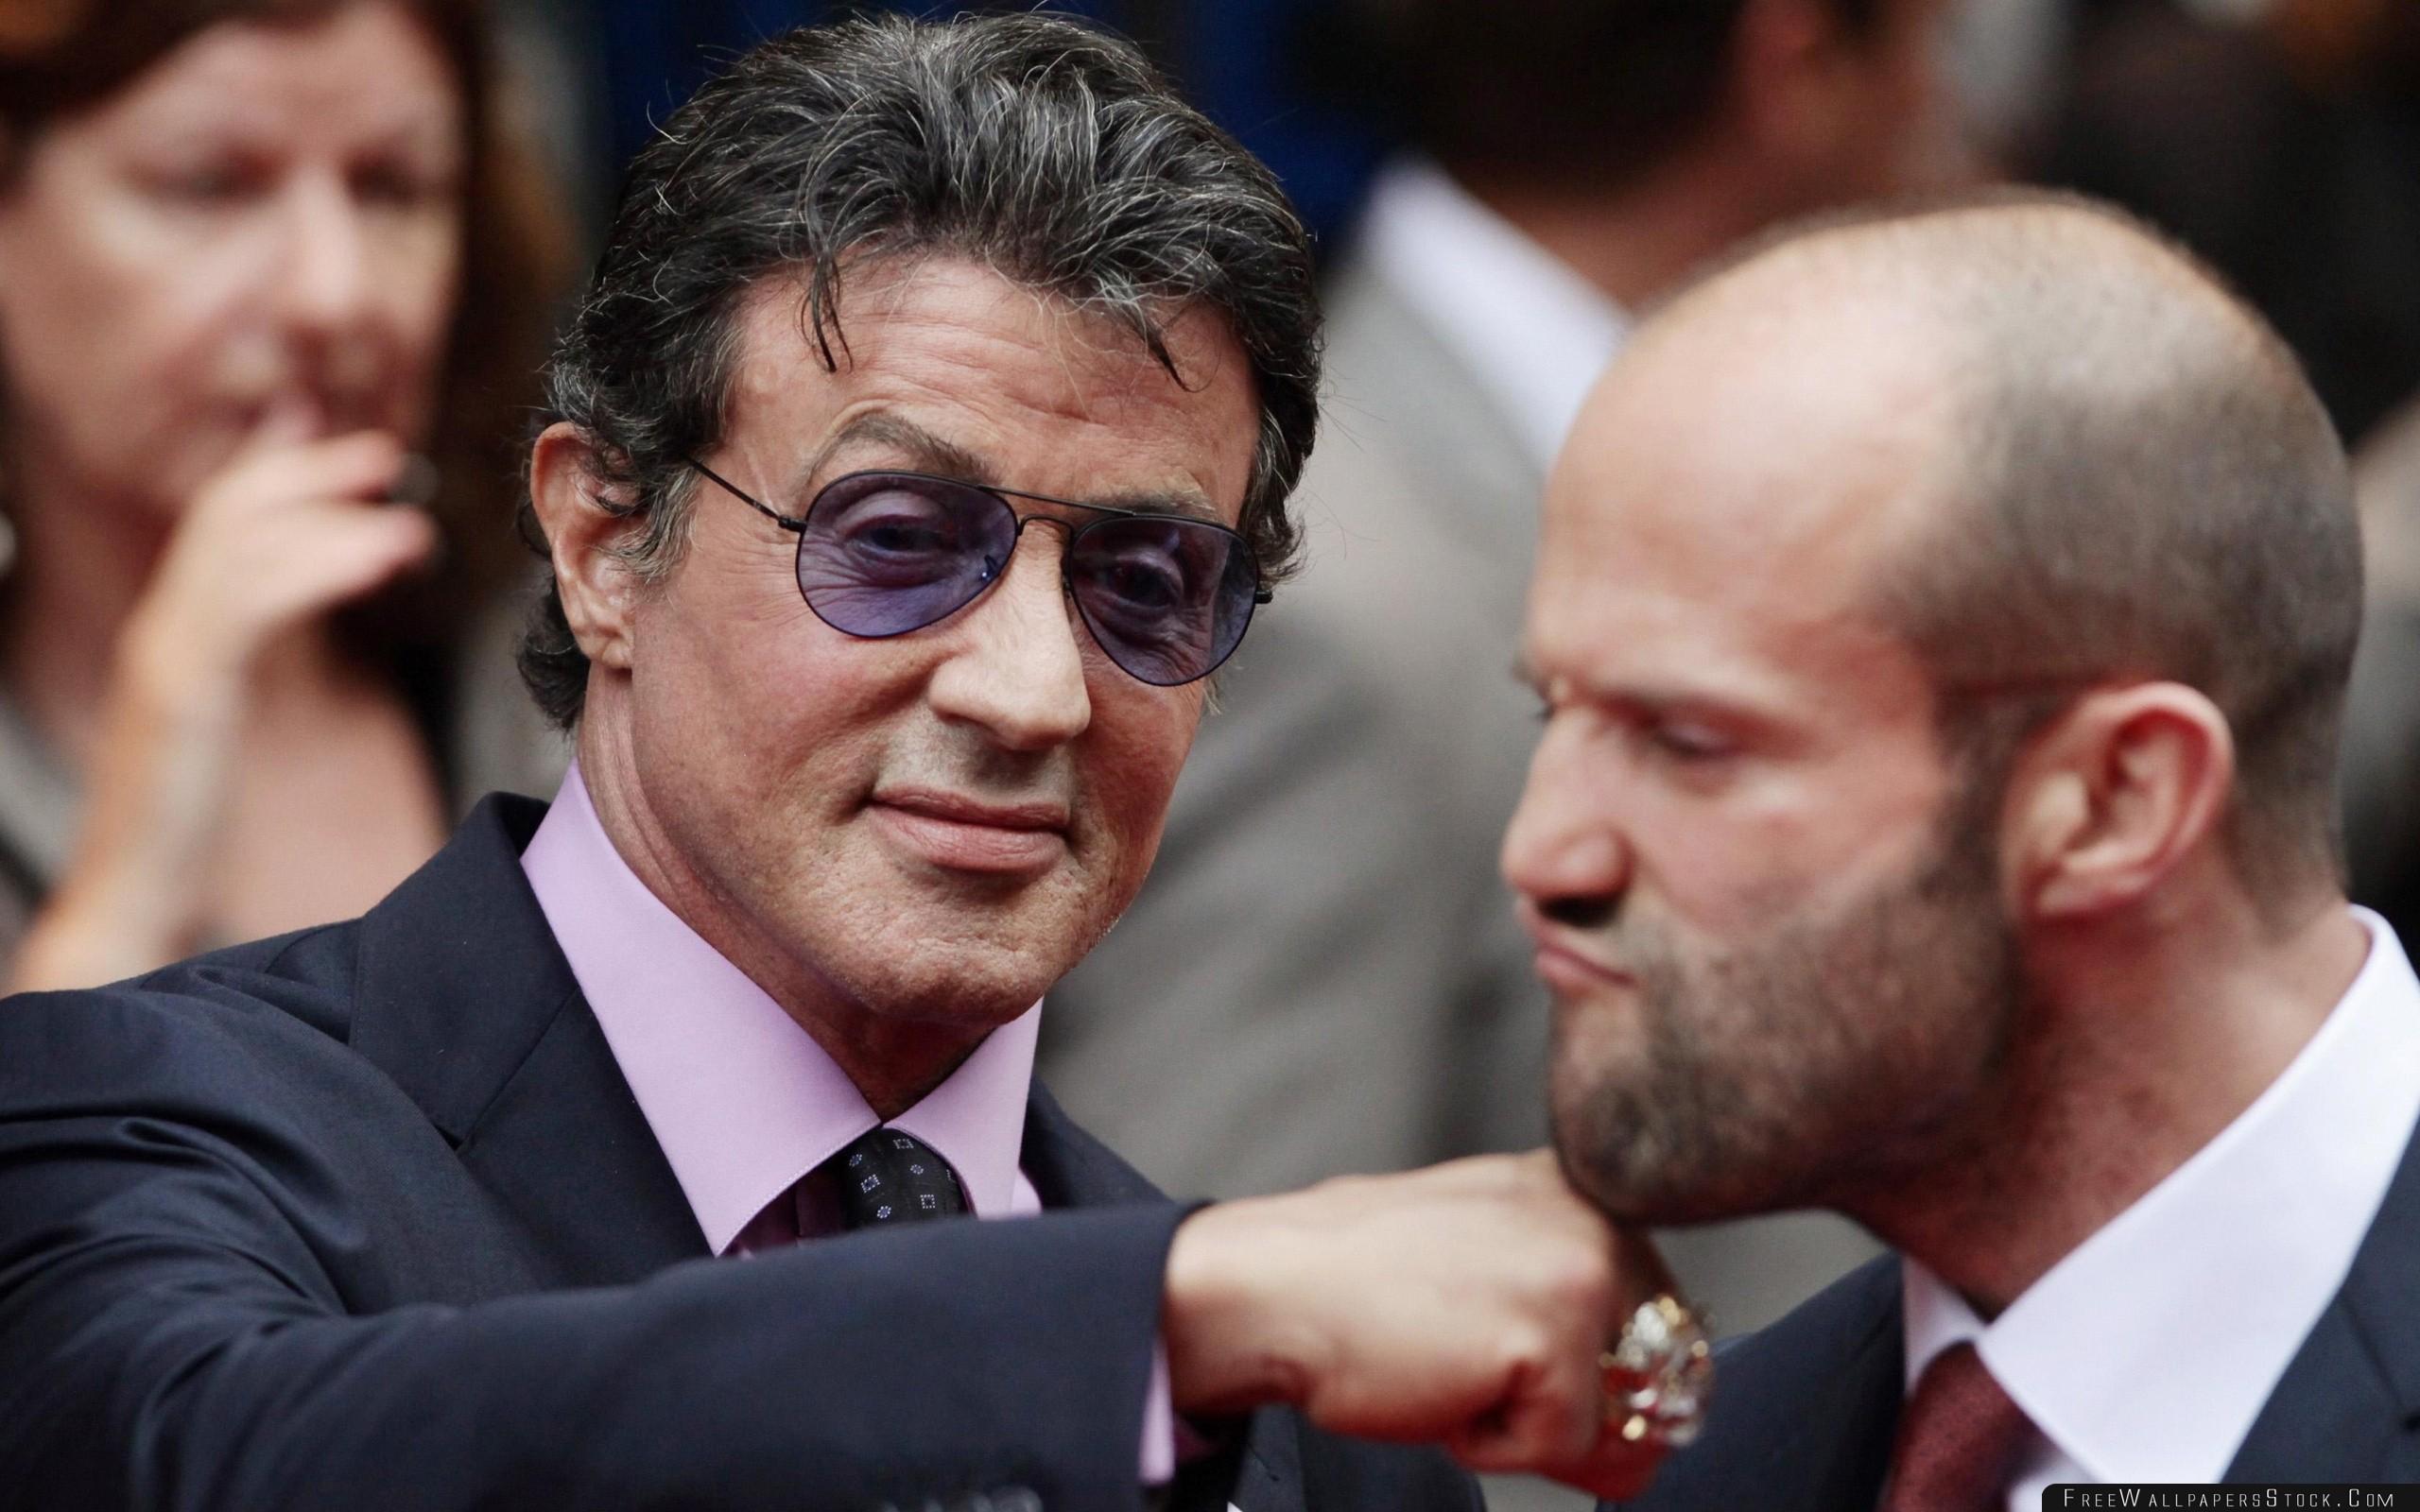 Download Free Wallpaper Sylvester Stallone Jason Statham Celebrities Humor